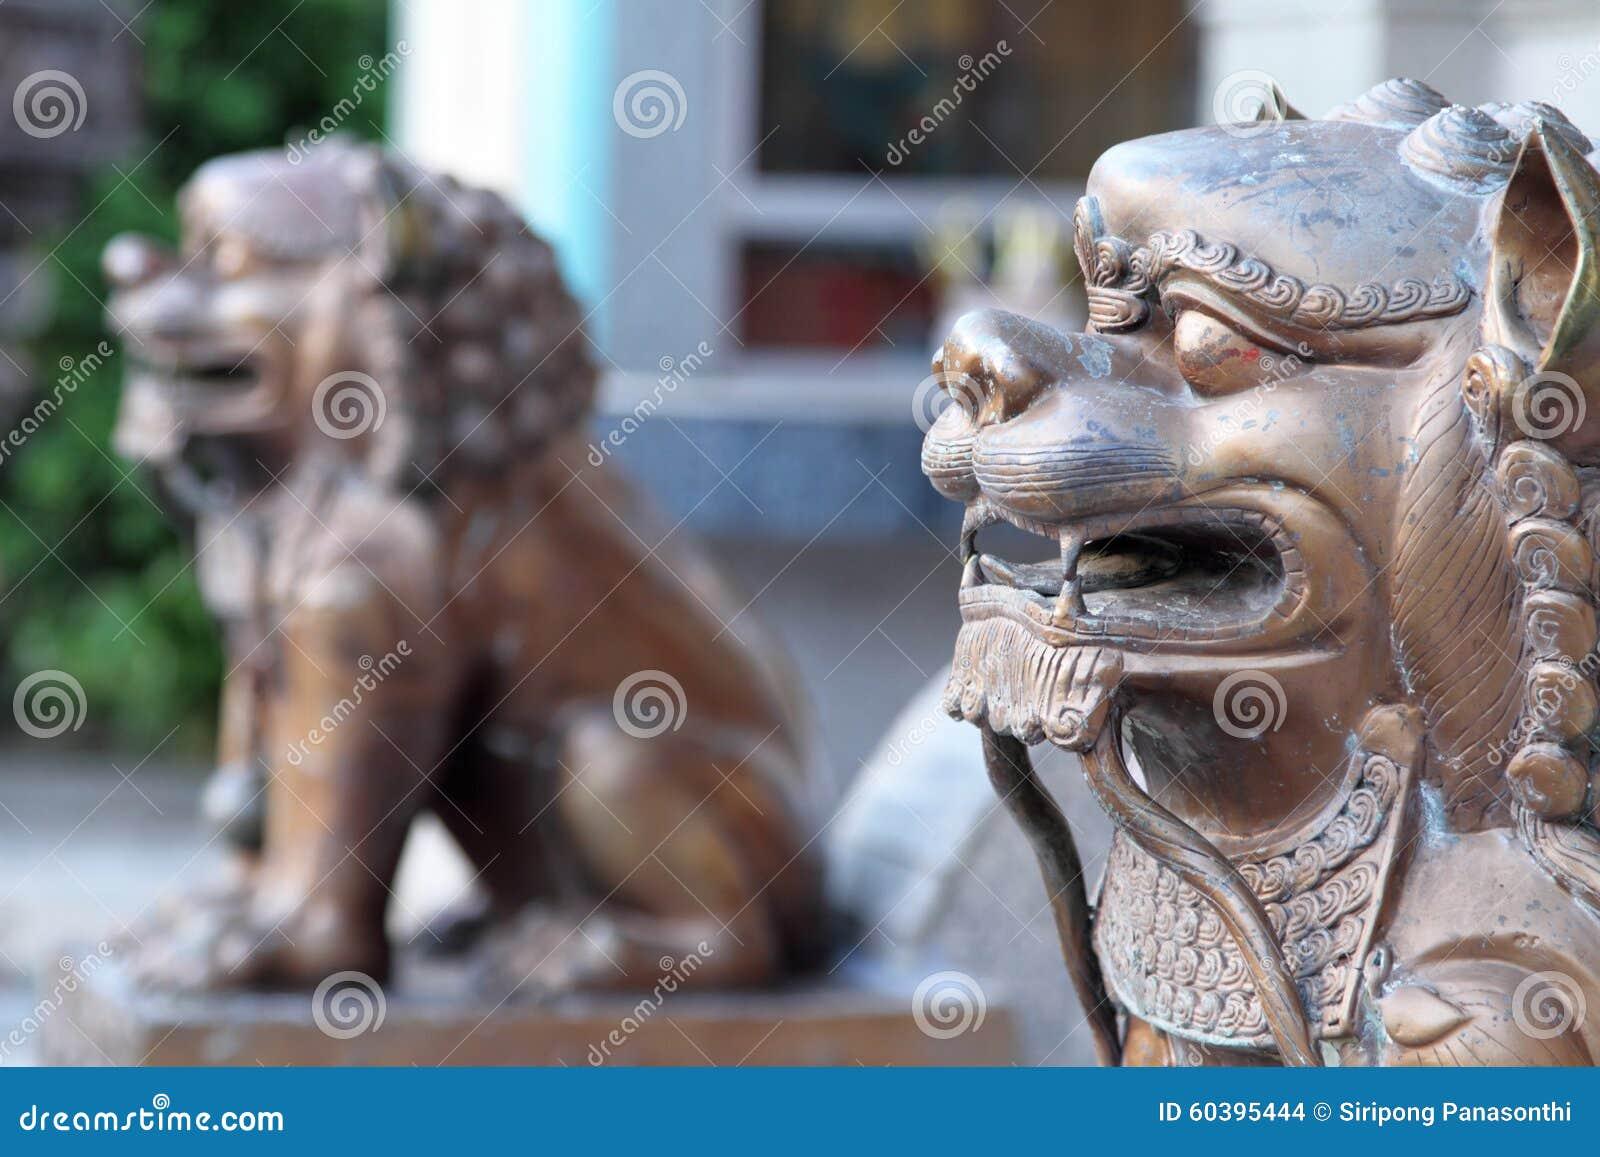 Iron lion statues